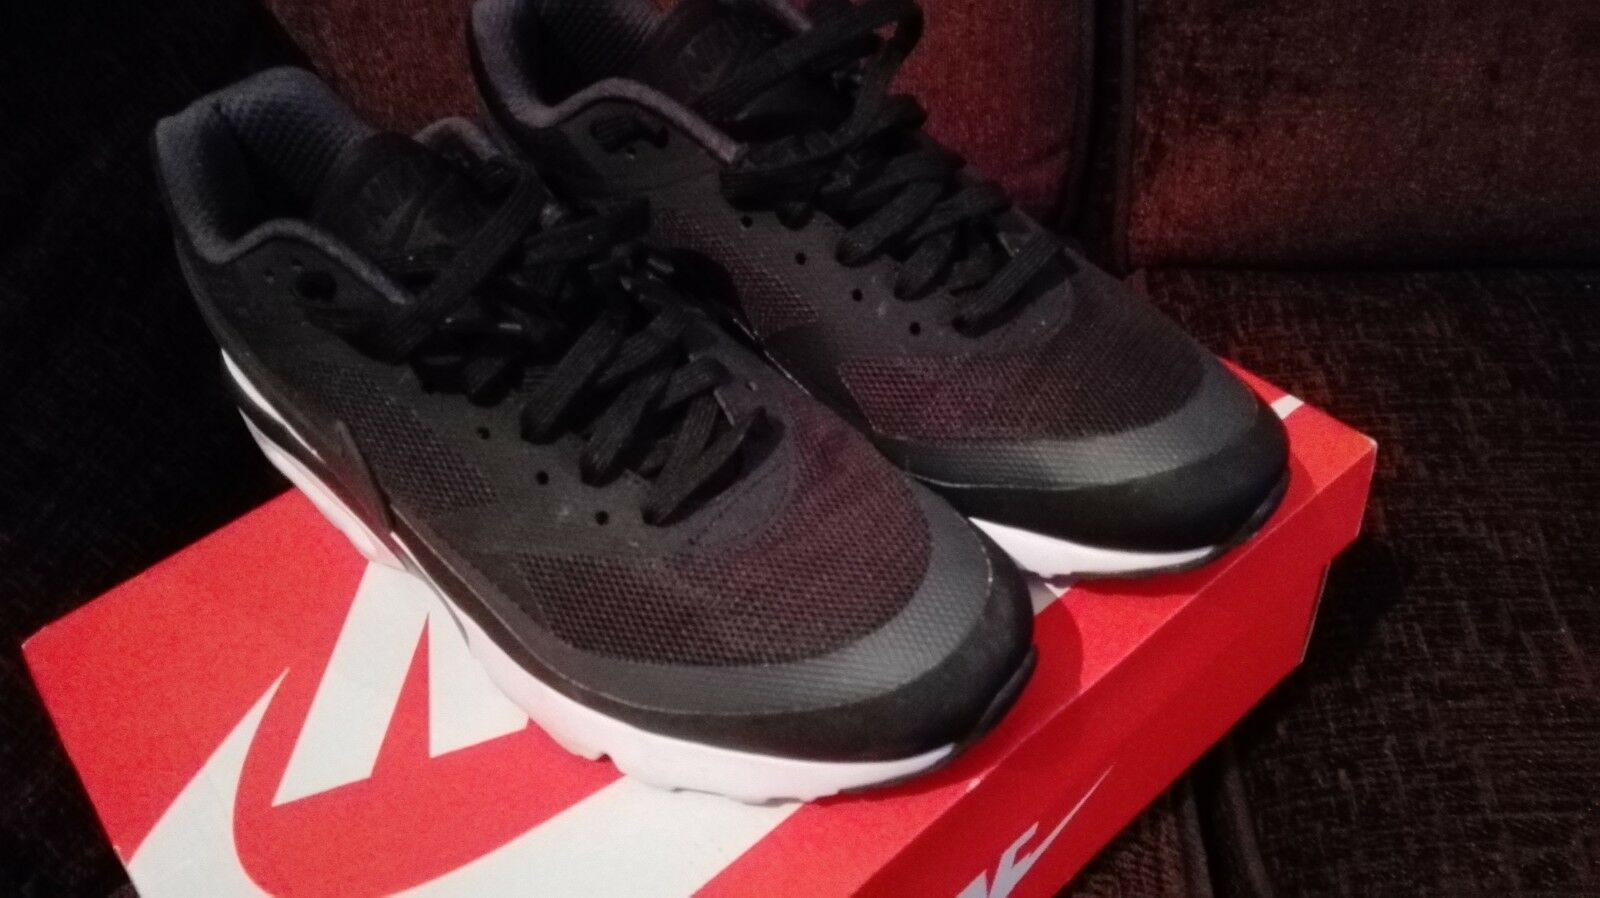 Nike AIR MAX MAX MAX BW Ultra Classic Scarpe Da Ginnastica Nero/Bianco Taglia d96988